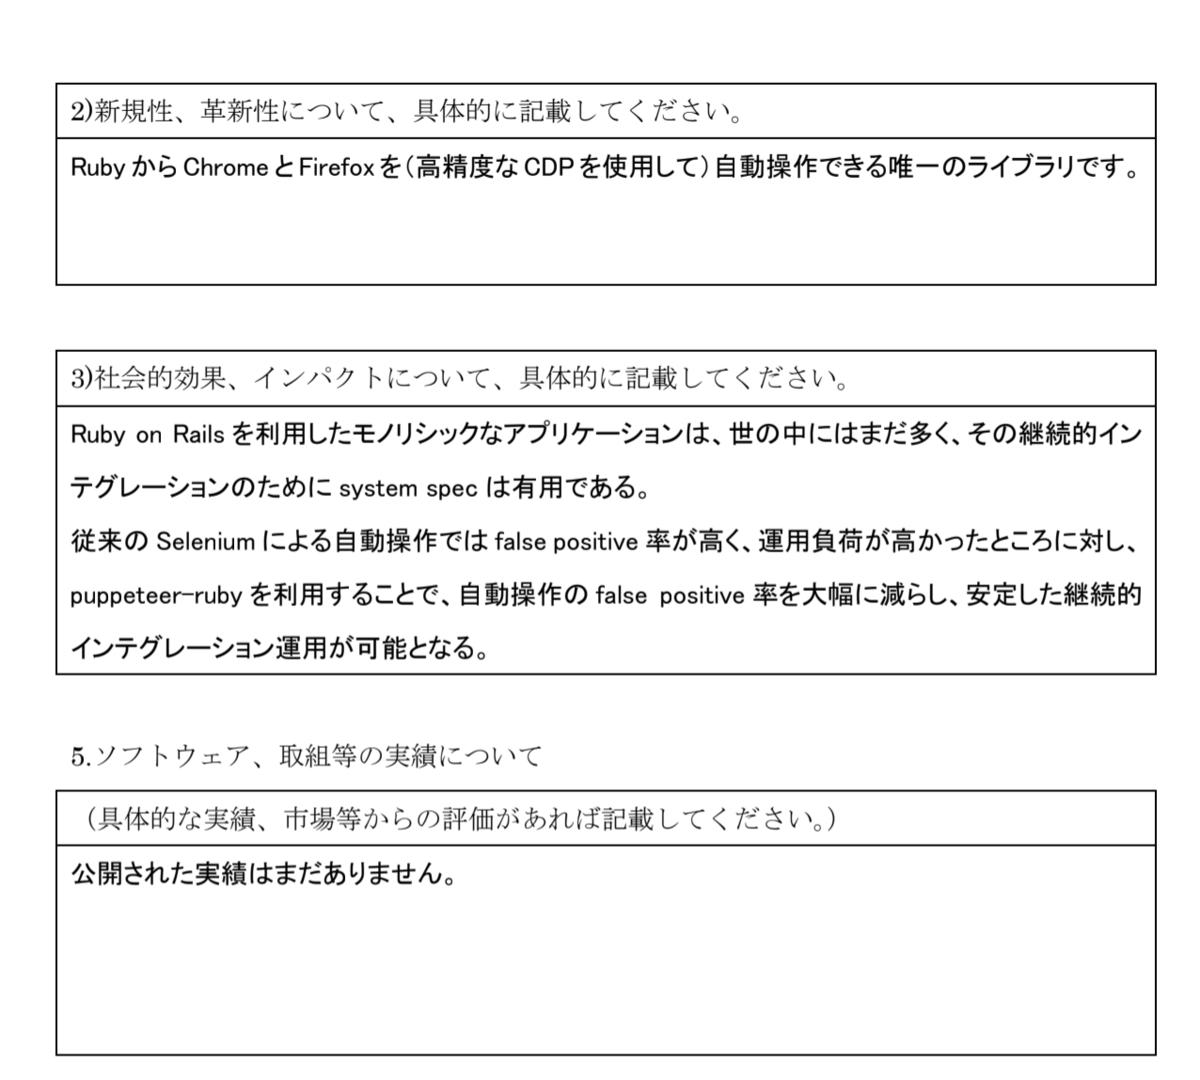 f:id:YusukeIwaki:20210124152233p:plain